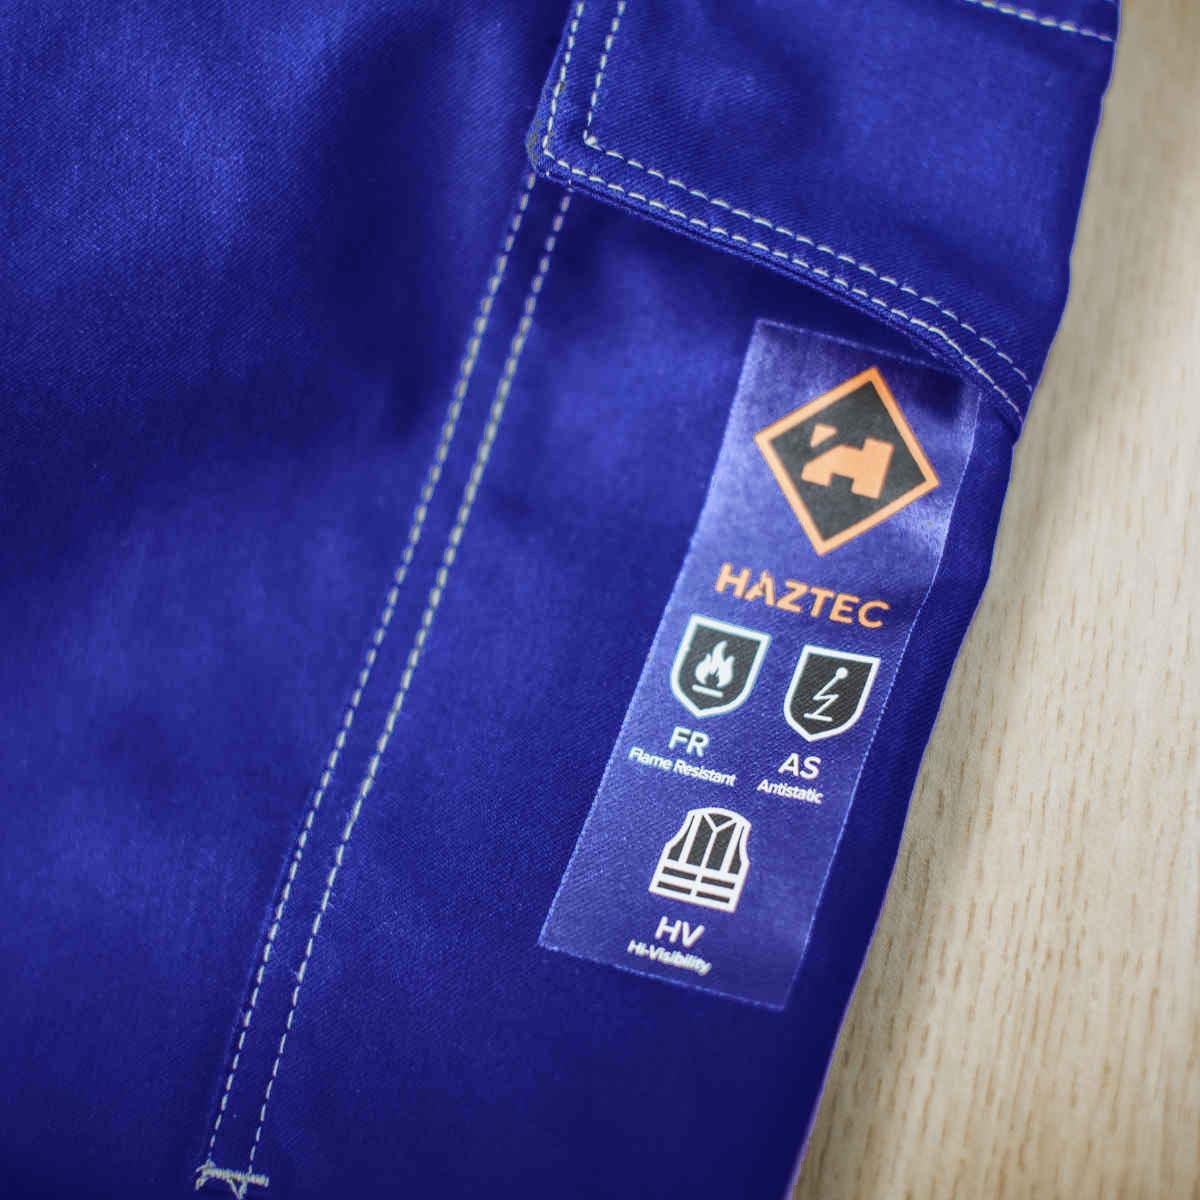 AS0065-HAZTEC-Kilmar-FR-AS-Trouser-EN-Icon